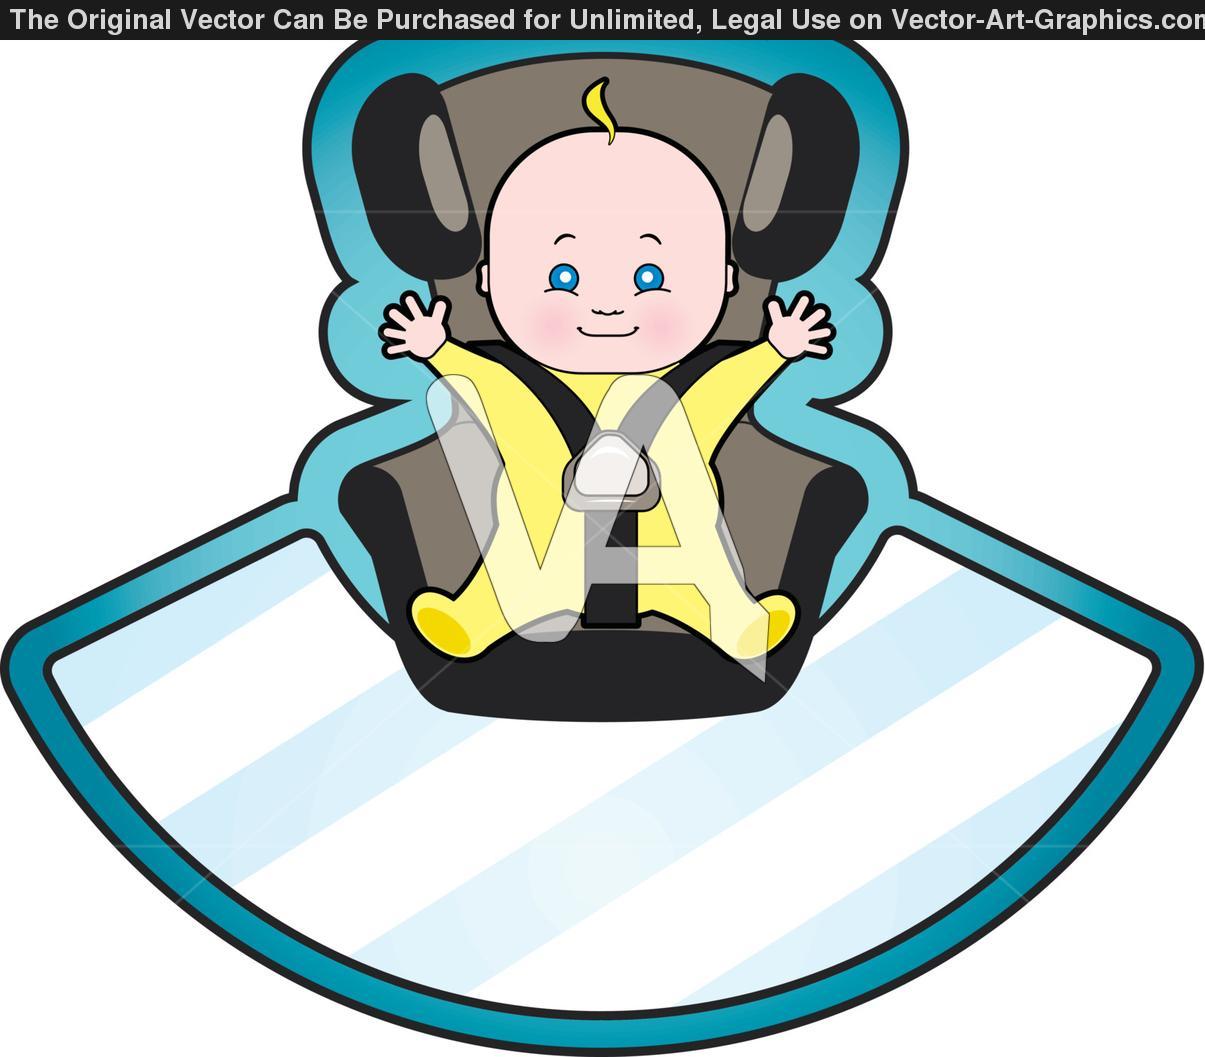 car seat clipart - photo #21